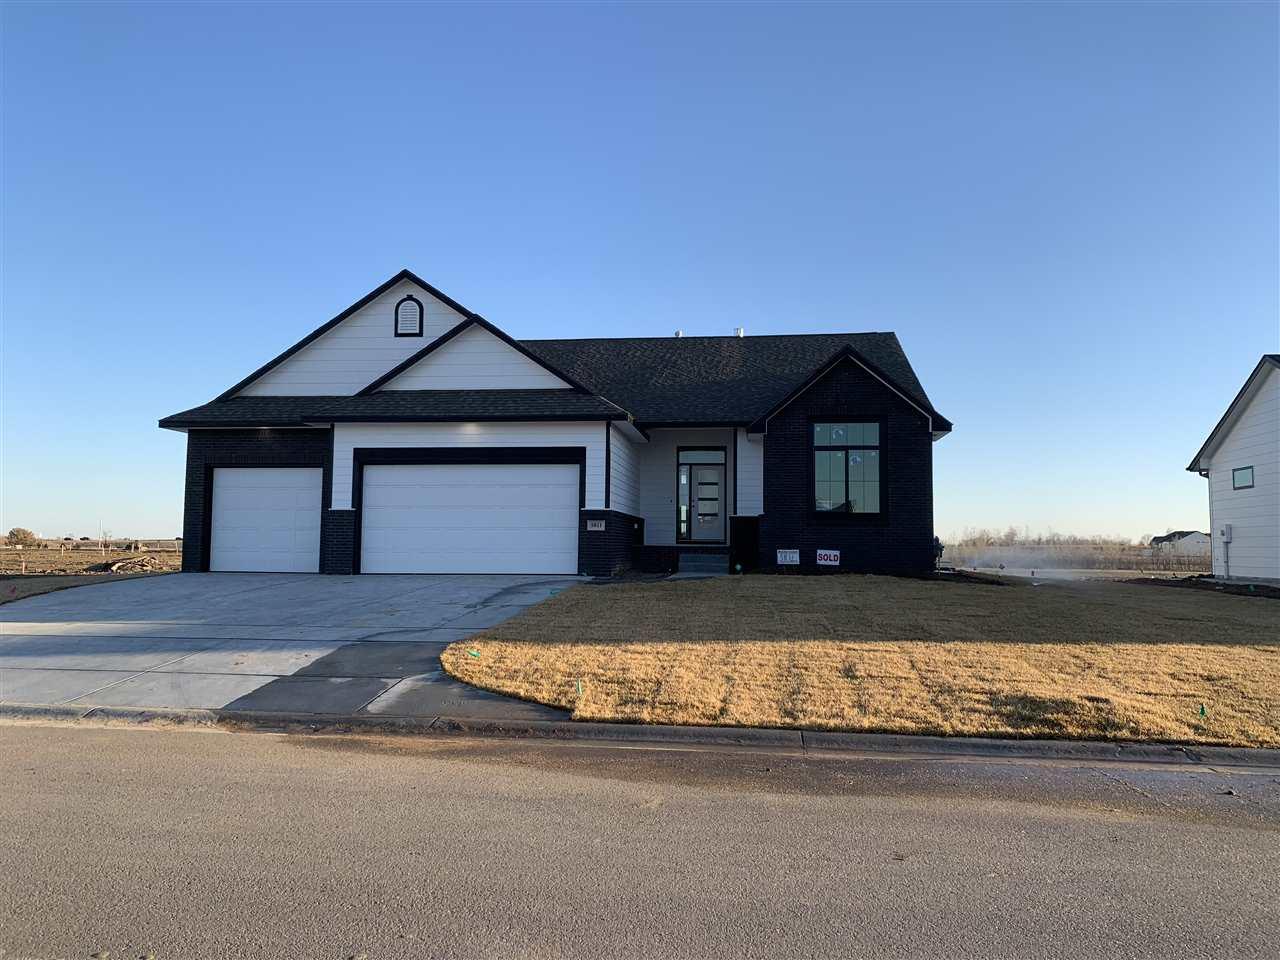 For Sale: 5811 Driftwood St, Wichita, KS, 67205,